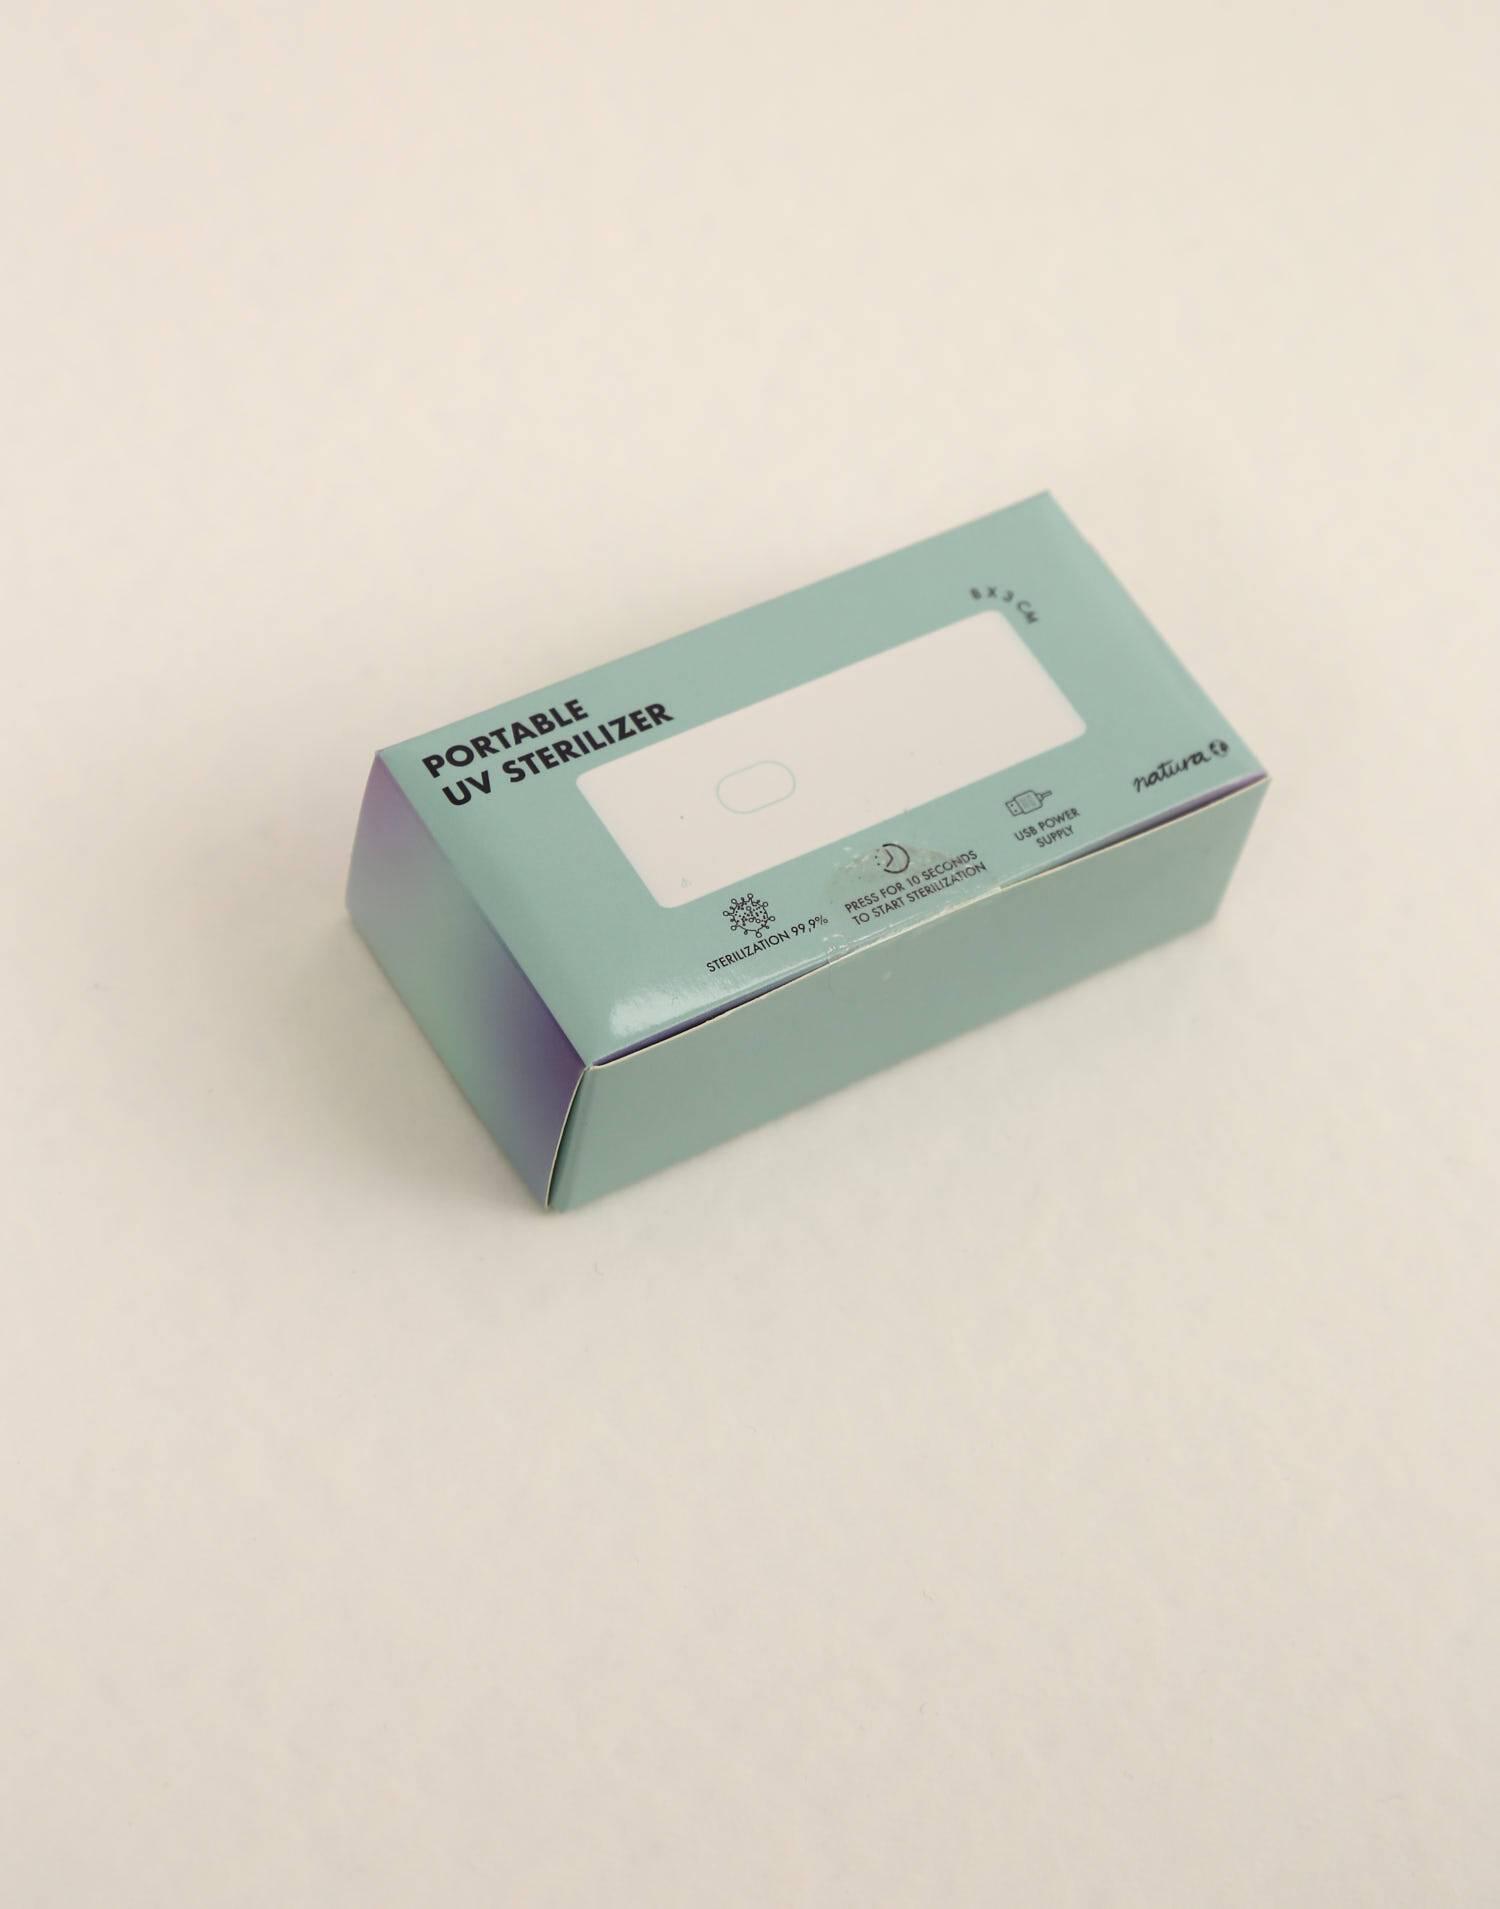 Lampada sterilizzatrice uv portatile